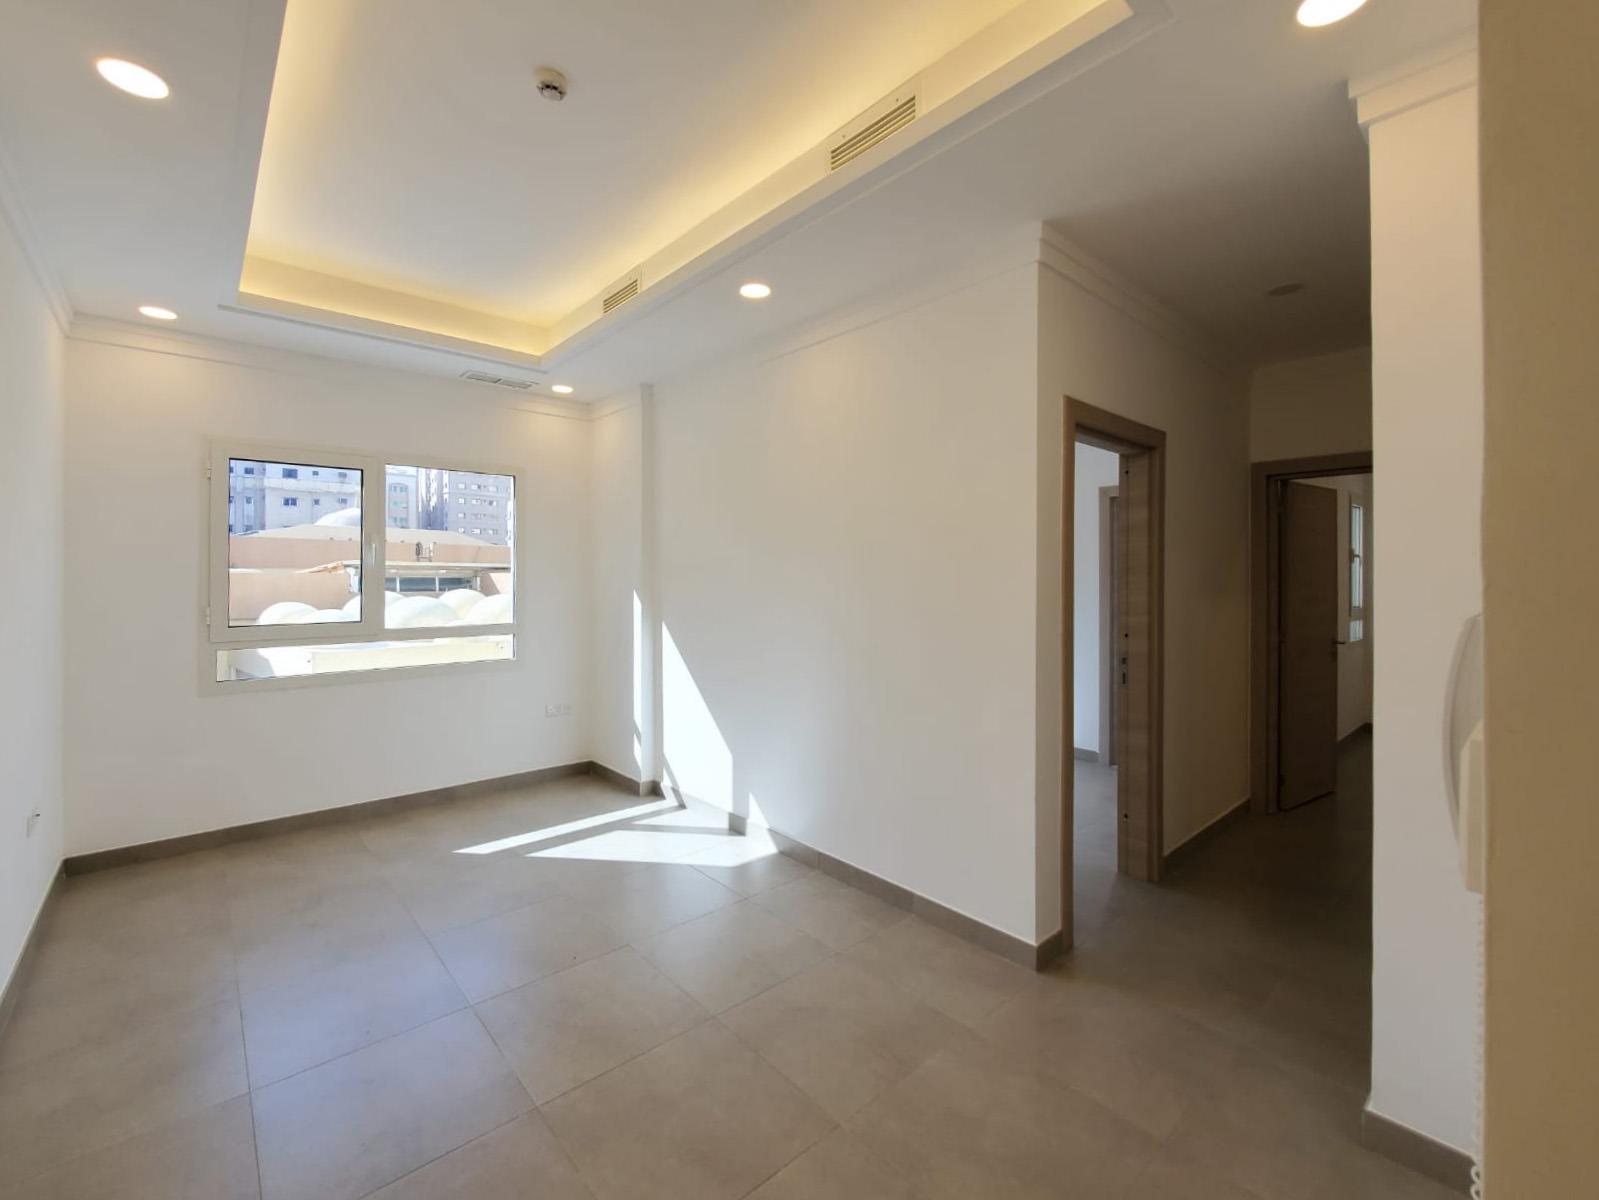 Salmiya – new, small two bedroom apartment